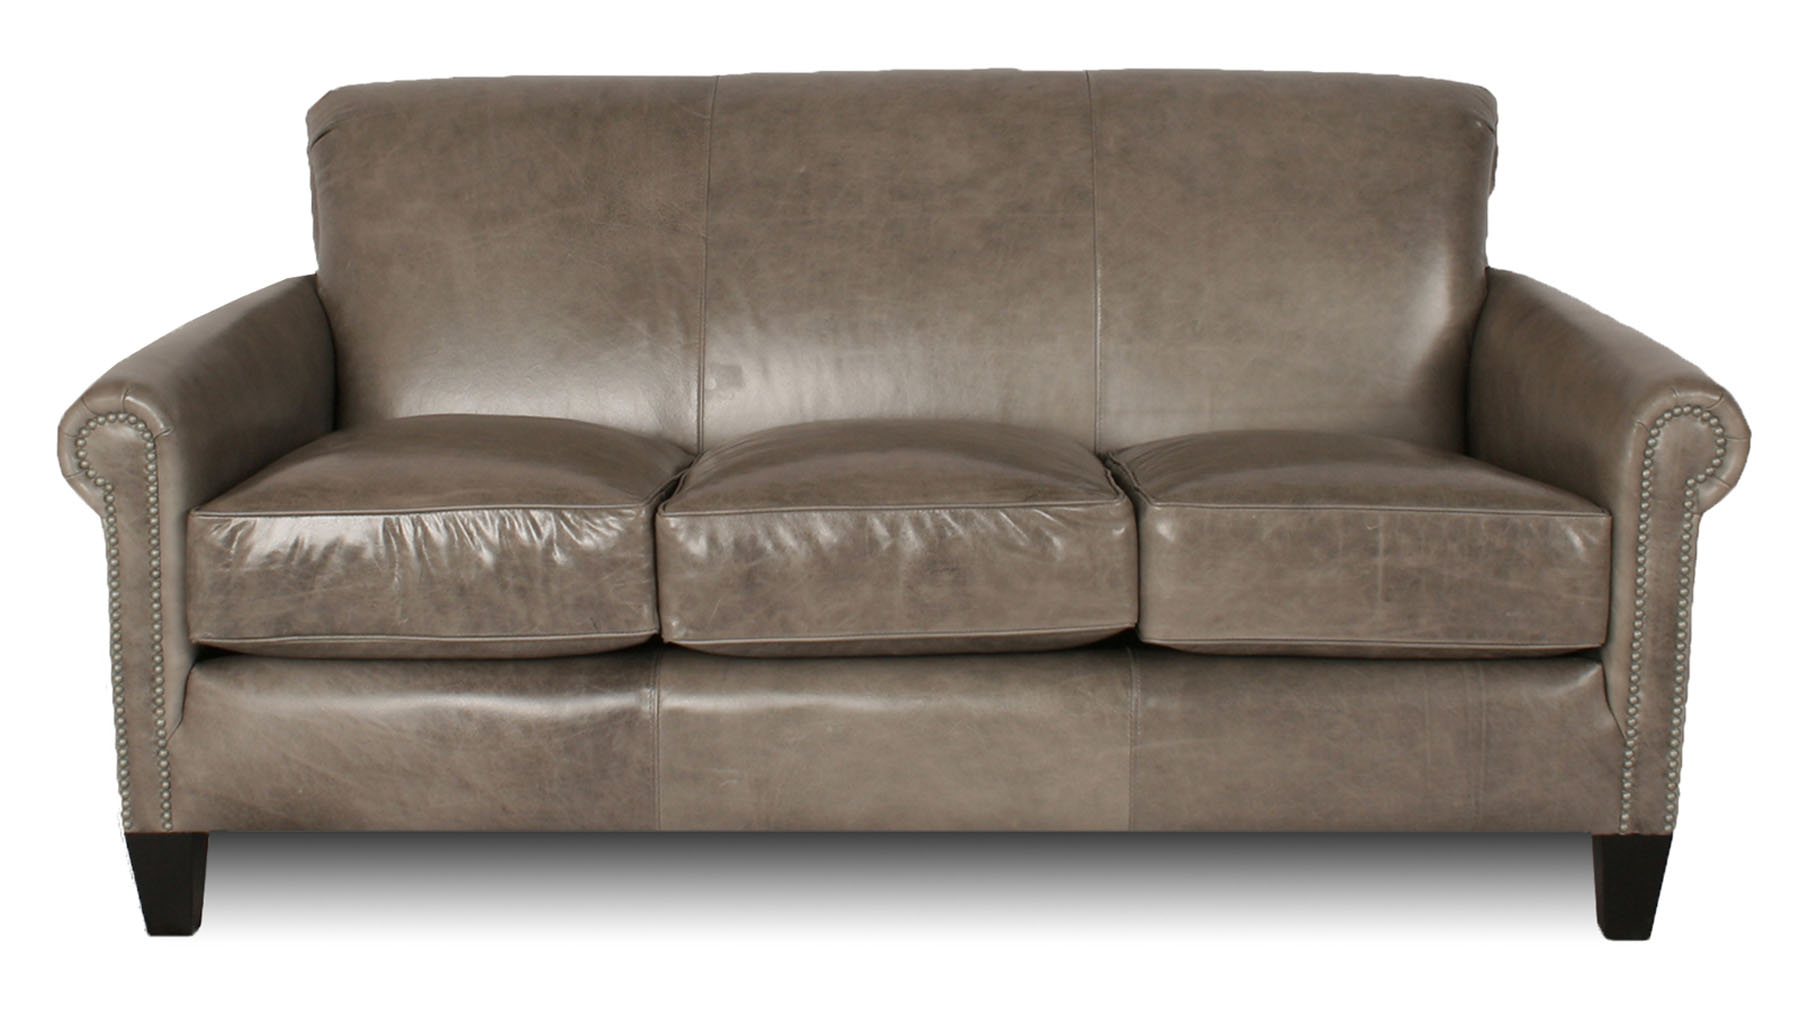 custom leather sofas modern grey corner sofa couch atlanta